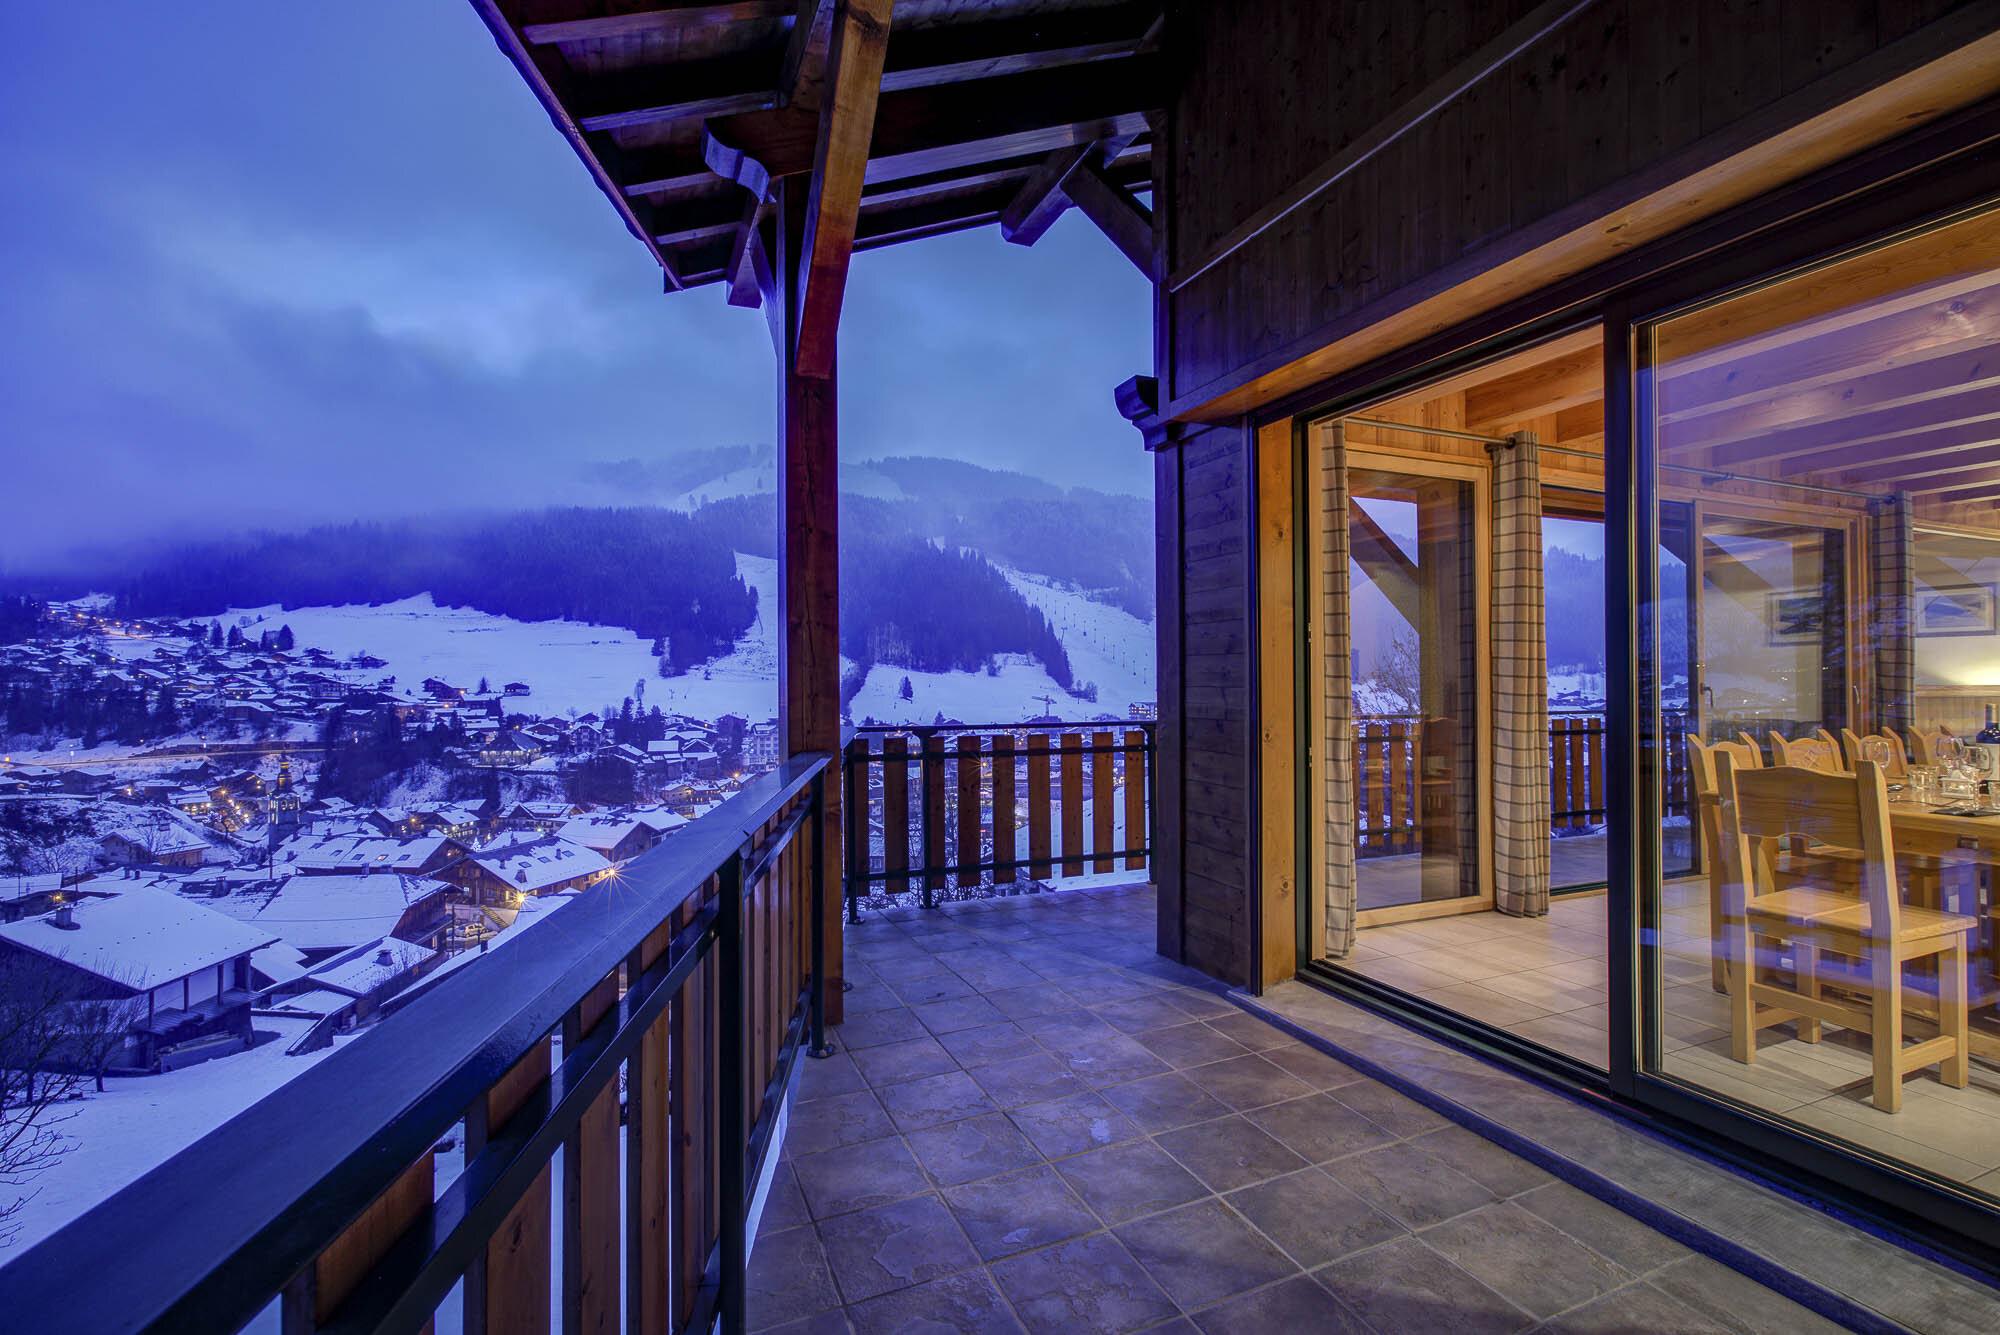 tg-ski-chalet-le-roc-soleil-morzine-019.jpg